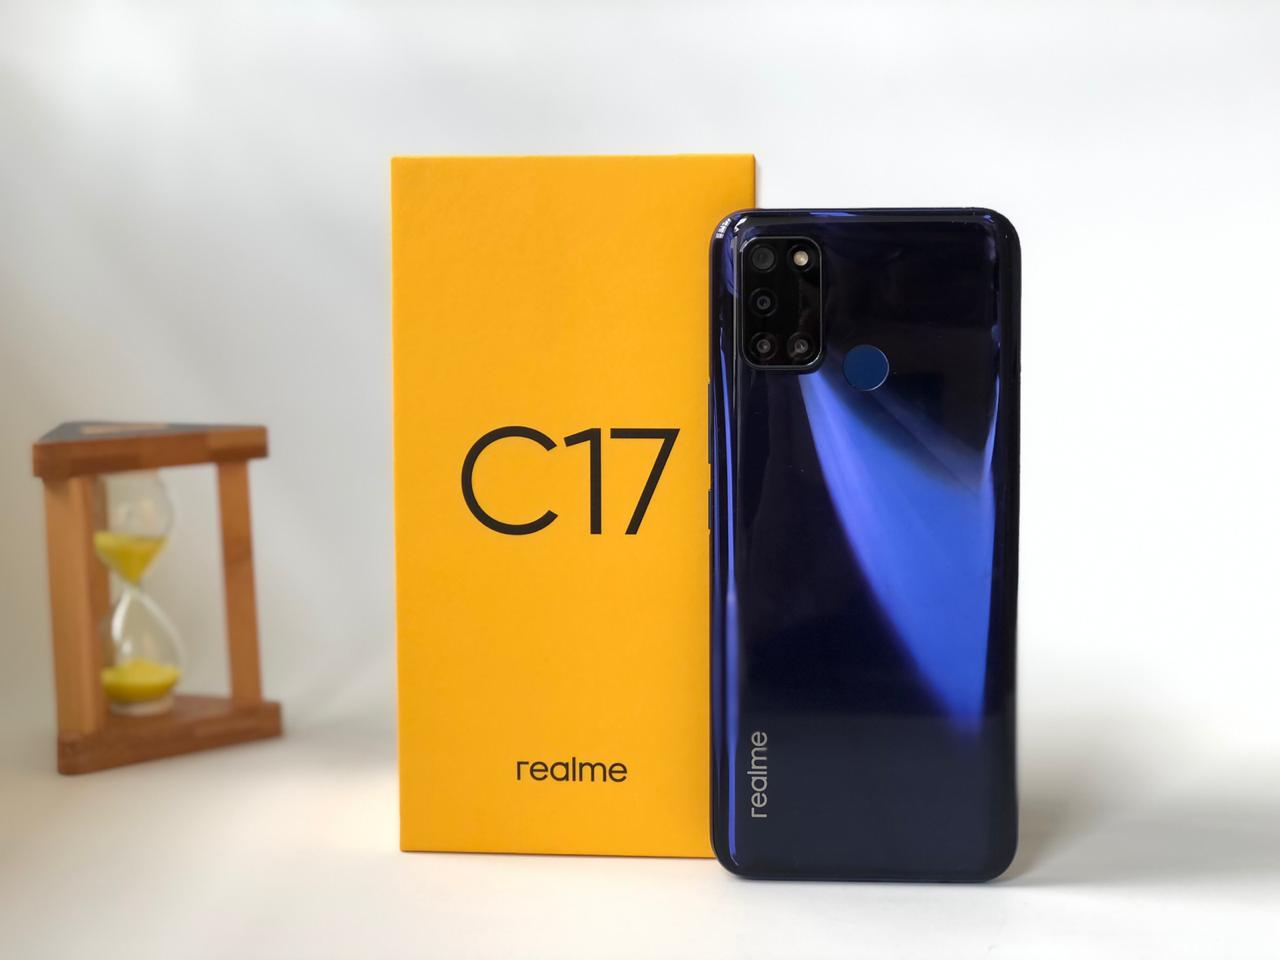 realme c17 (3)